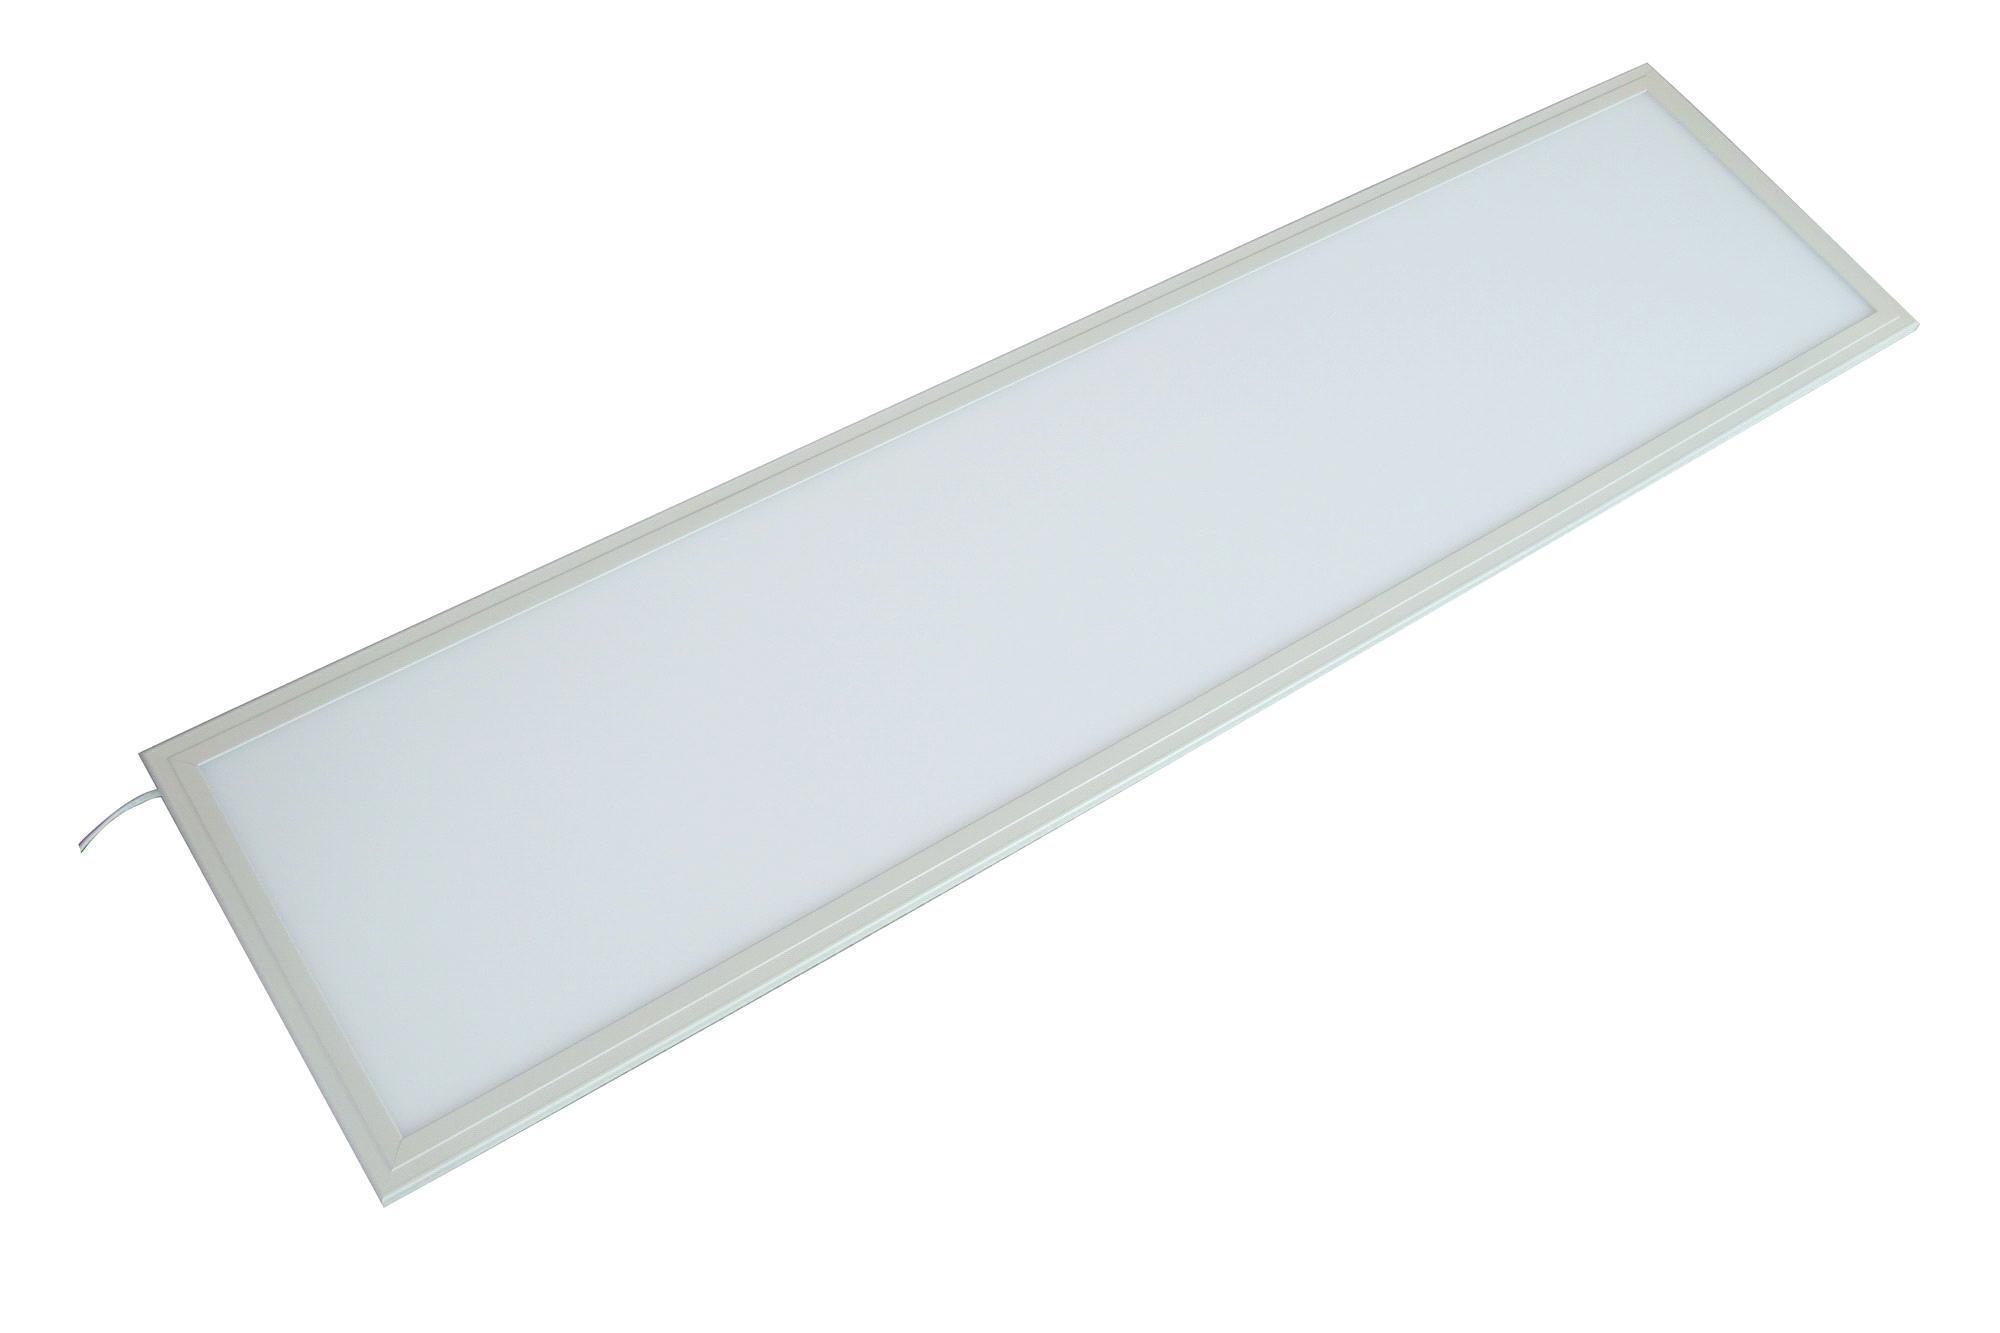 Aluminum Alloy Ultra Thin CE RoHS 45W Panel Light LED (OED-P1203045W-J0331)